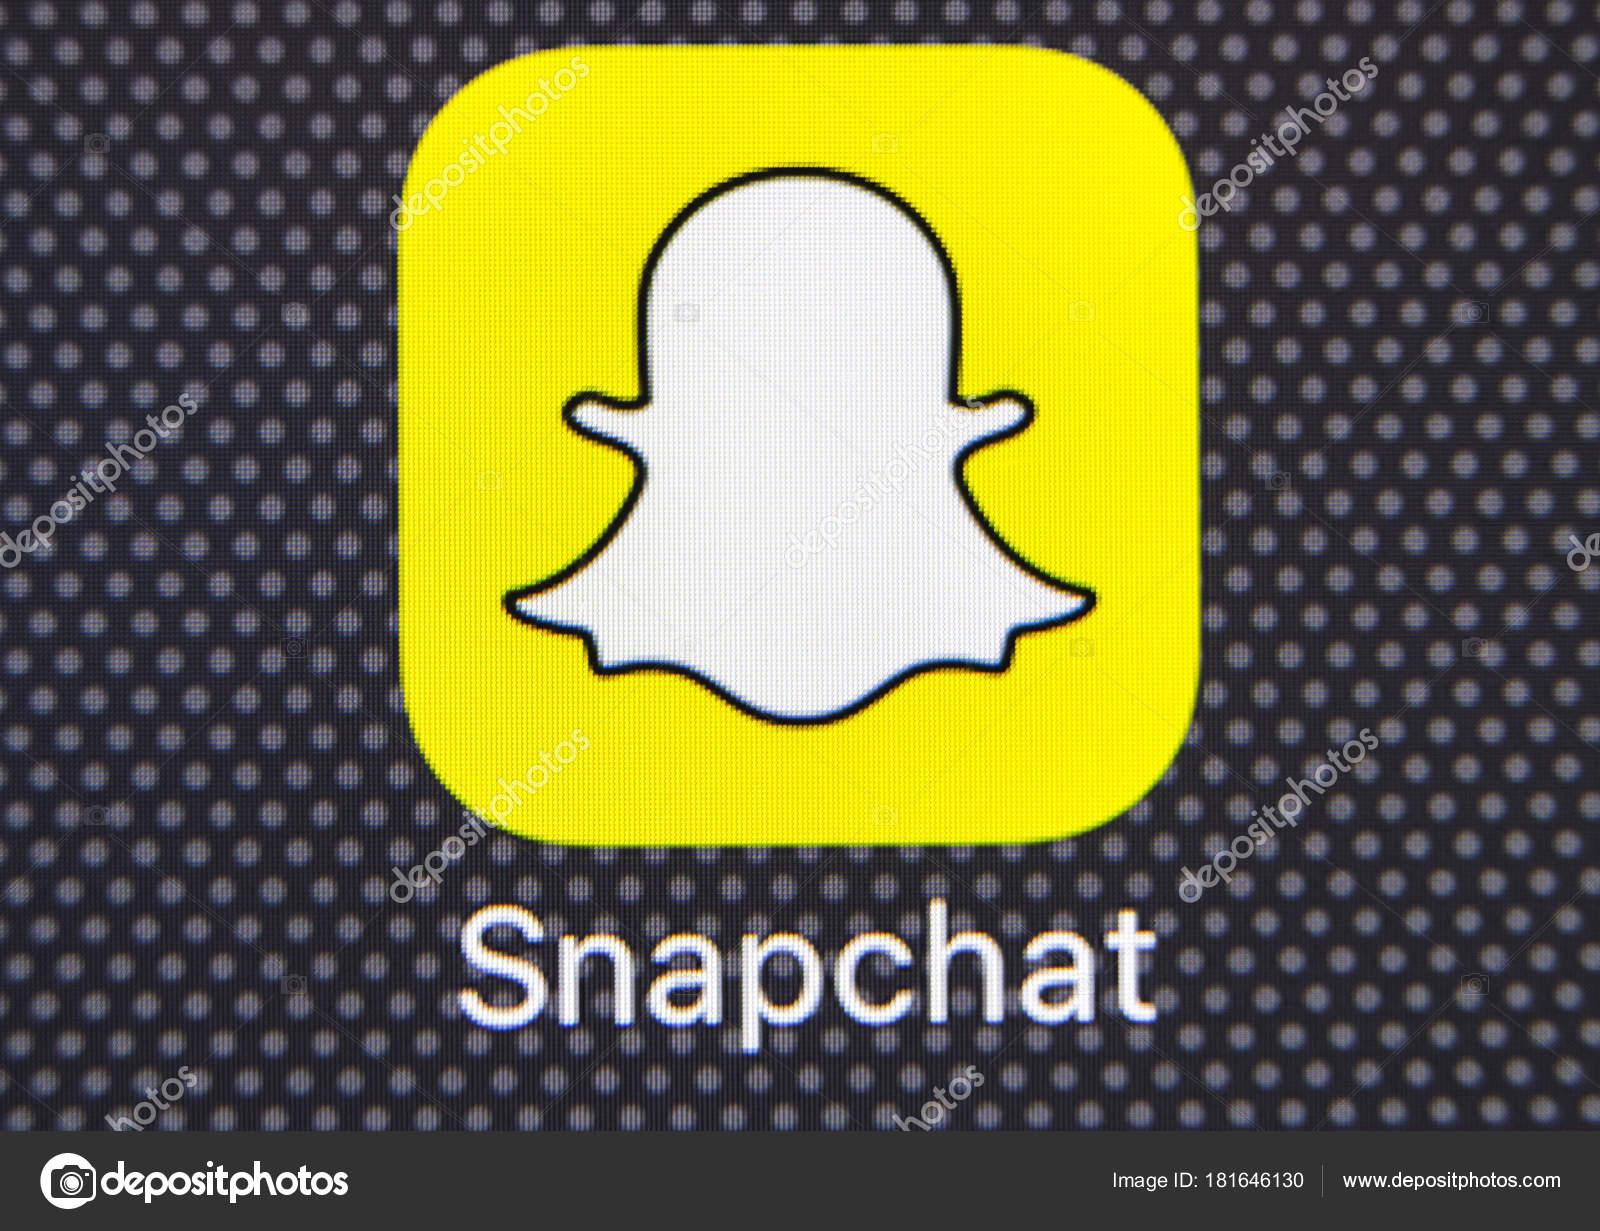 Snapchat application icon on apple iphone 8 smartphone screen snapchat application icon on apple iphone 8 smartphone screen close up snapchat app icon buycottarizona Choice Image